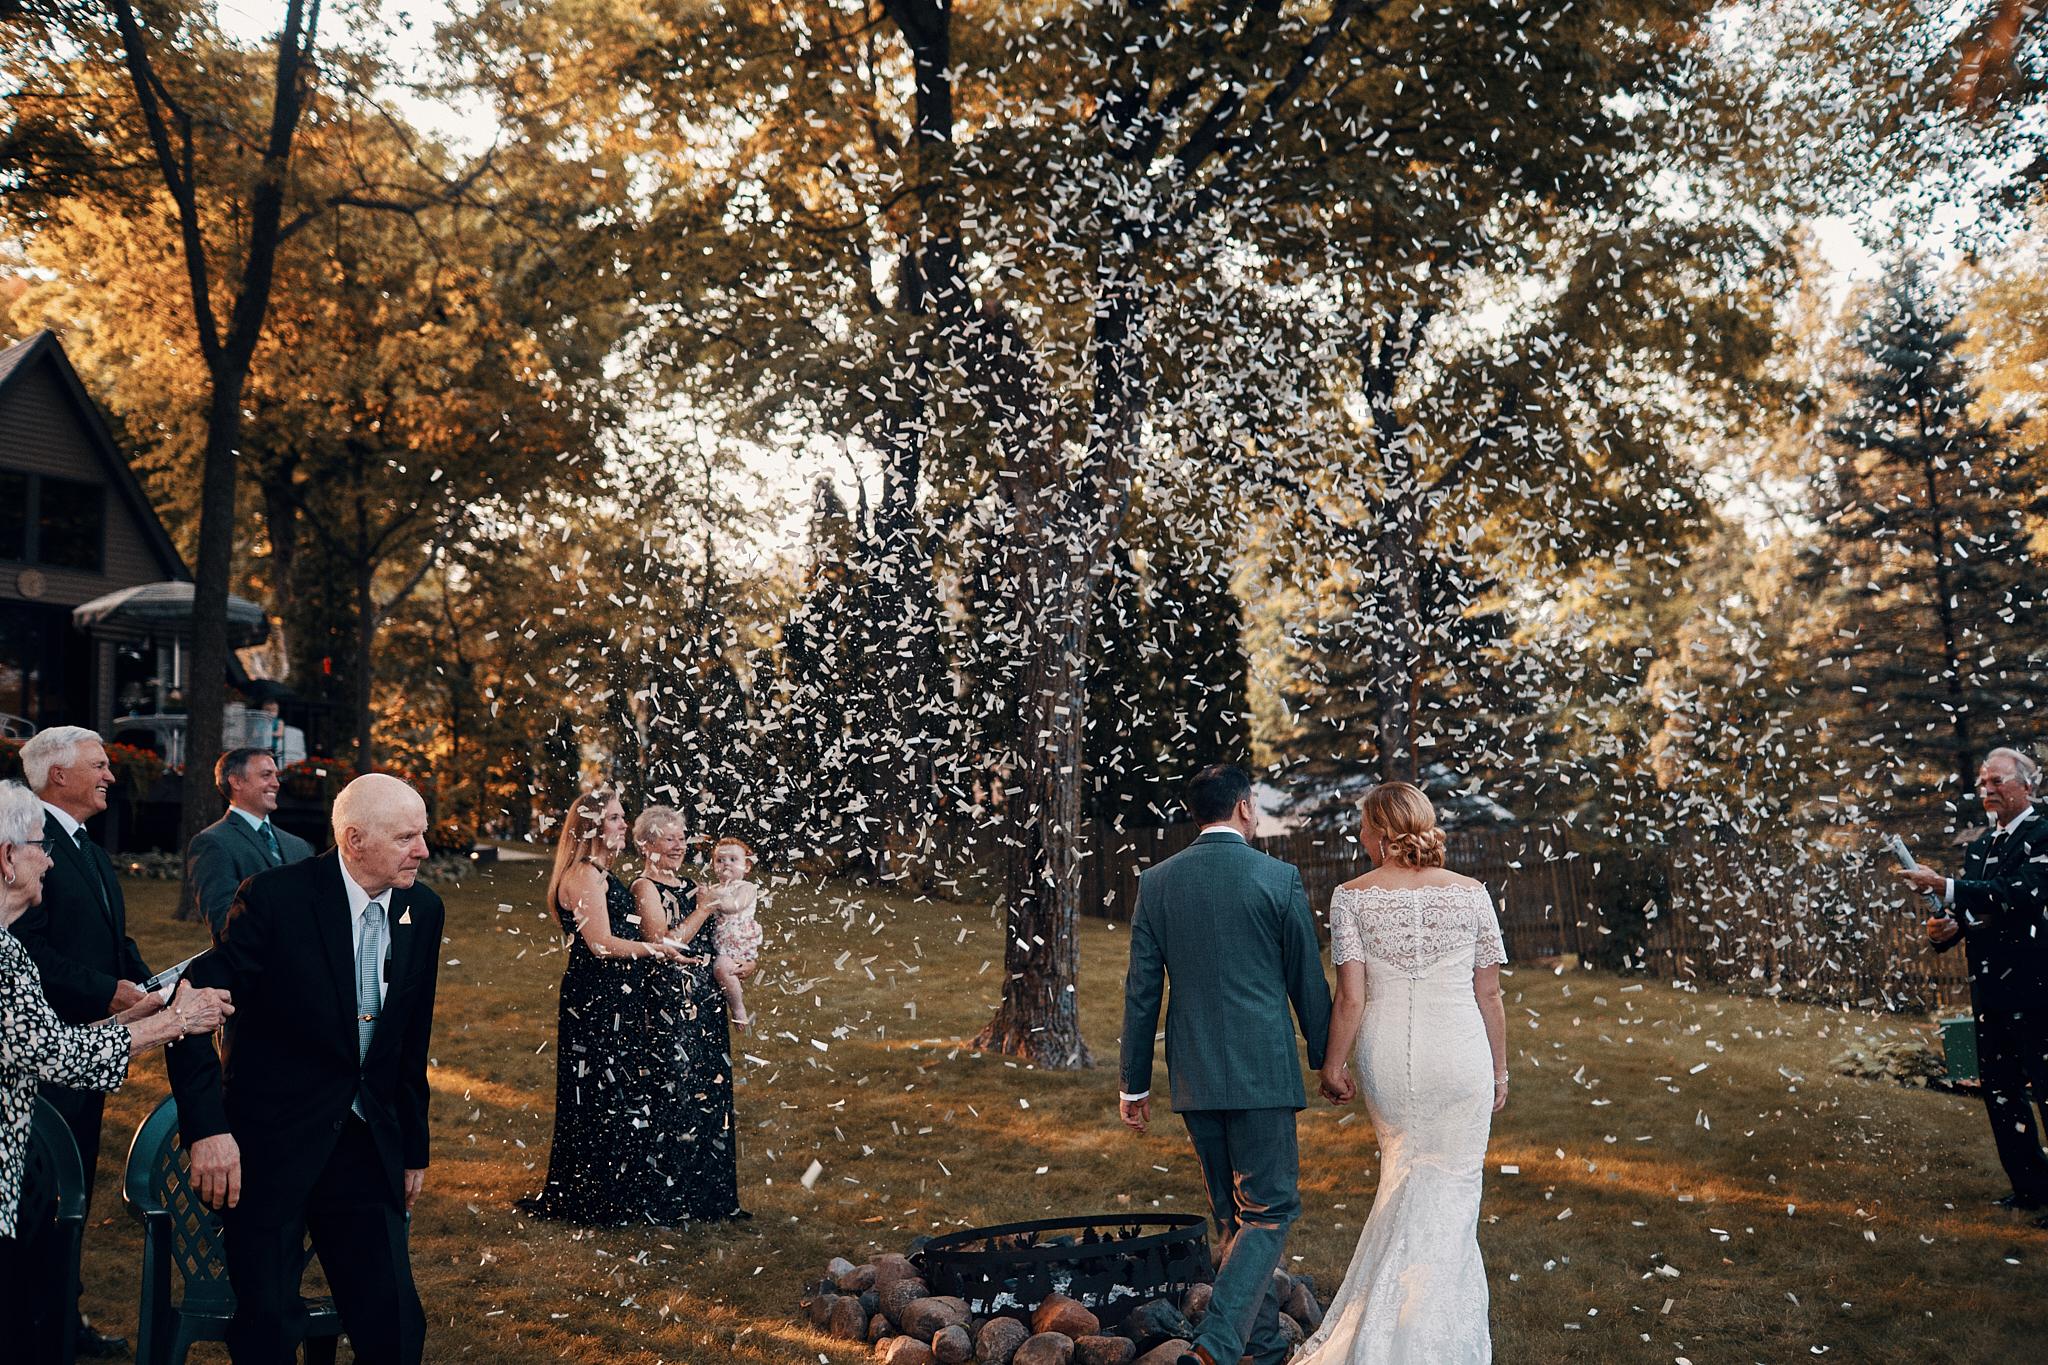 Killer_Field_Golden_Hour_Shot_In_Alexandria_Wedding_Photography_High_End_Minneapolis_Brand_Photographer_Something_Candid_025.JPG